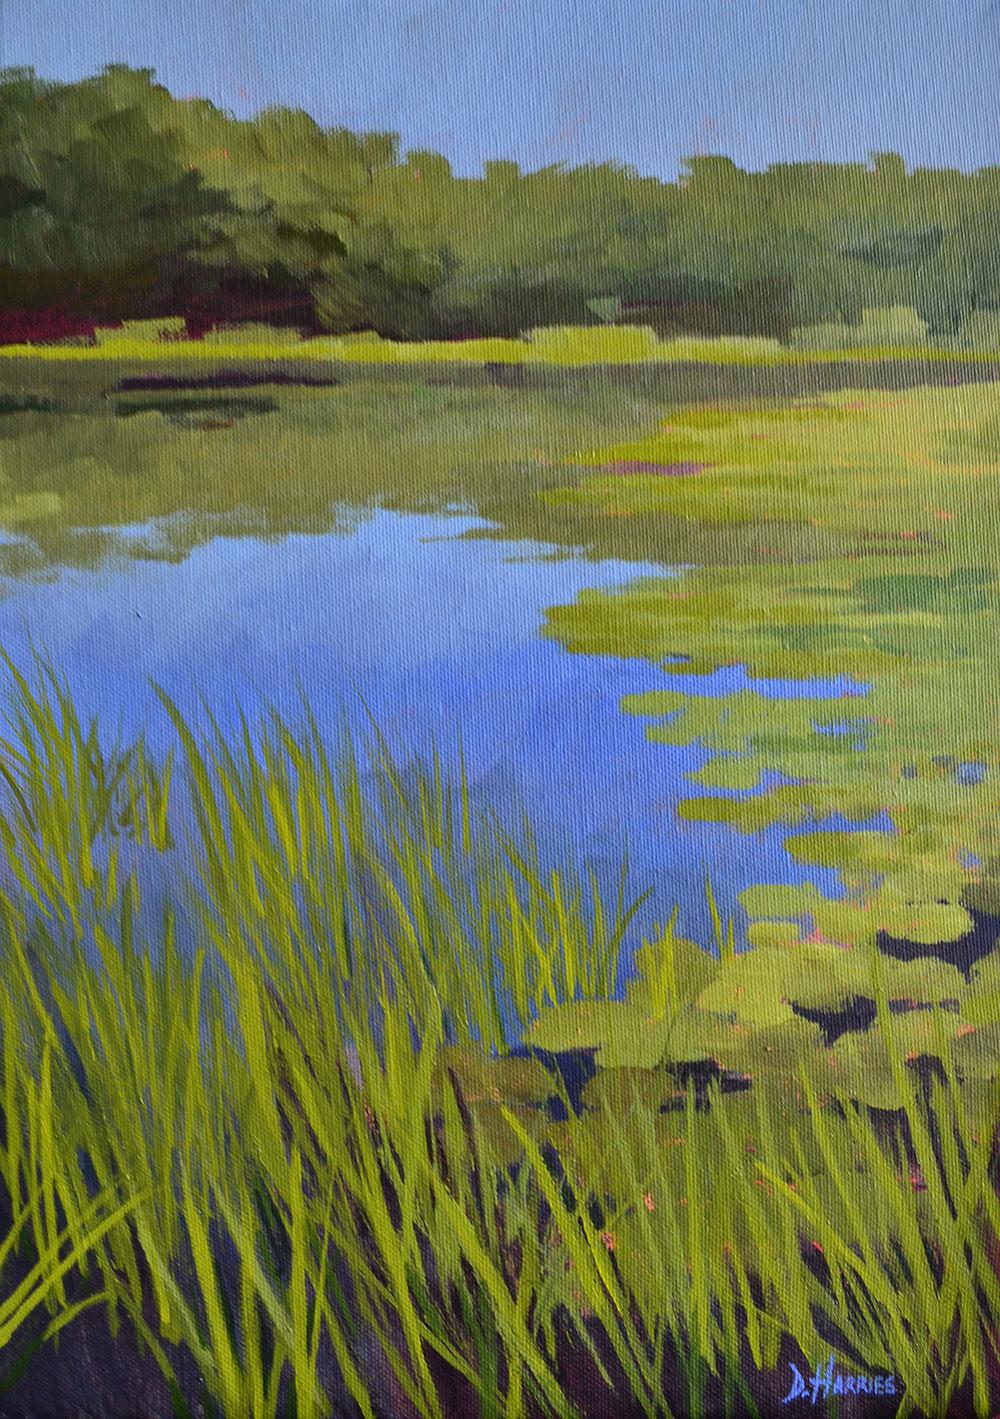 Bosherston-Lily-Ponds-side-view-1